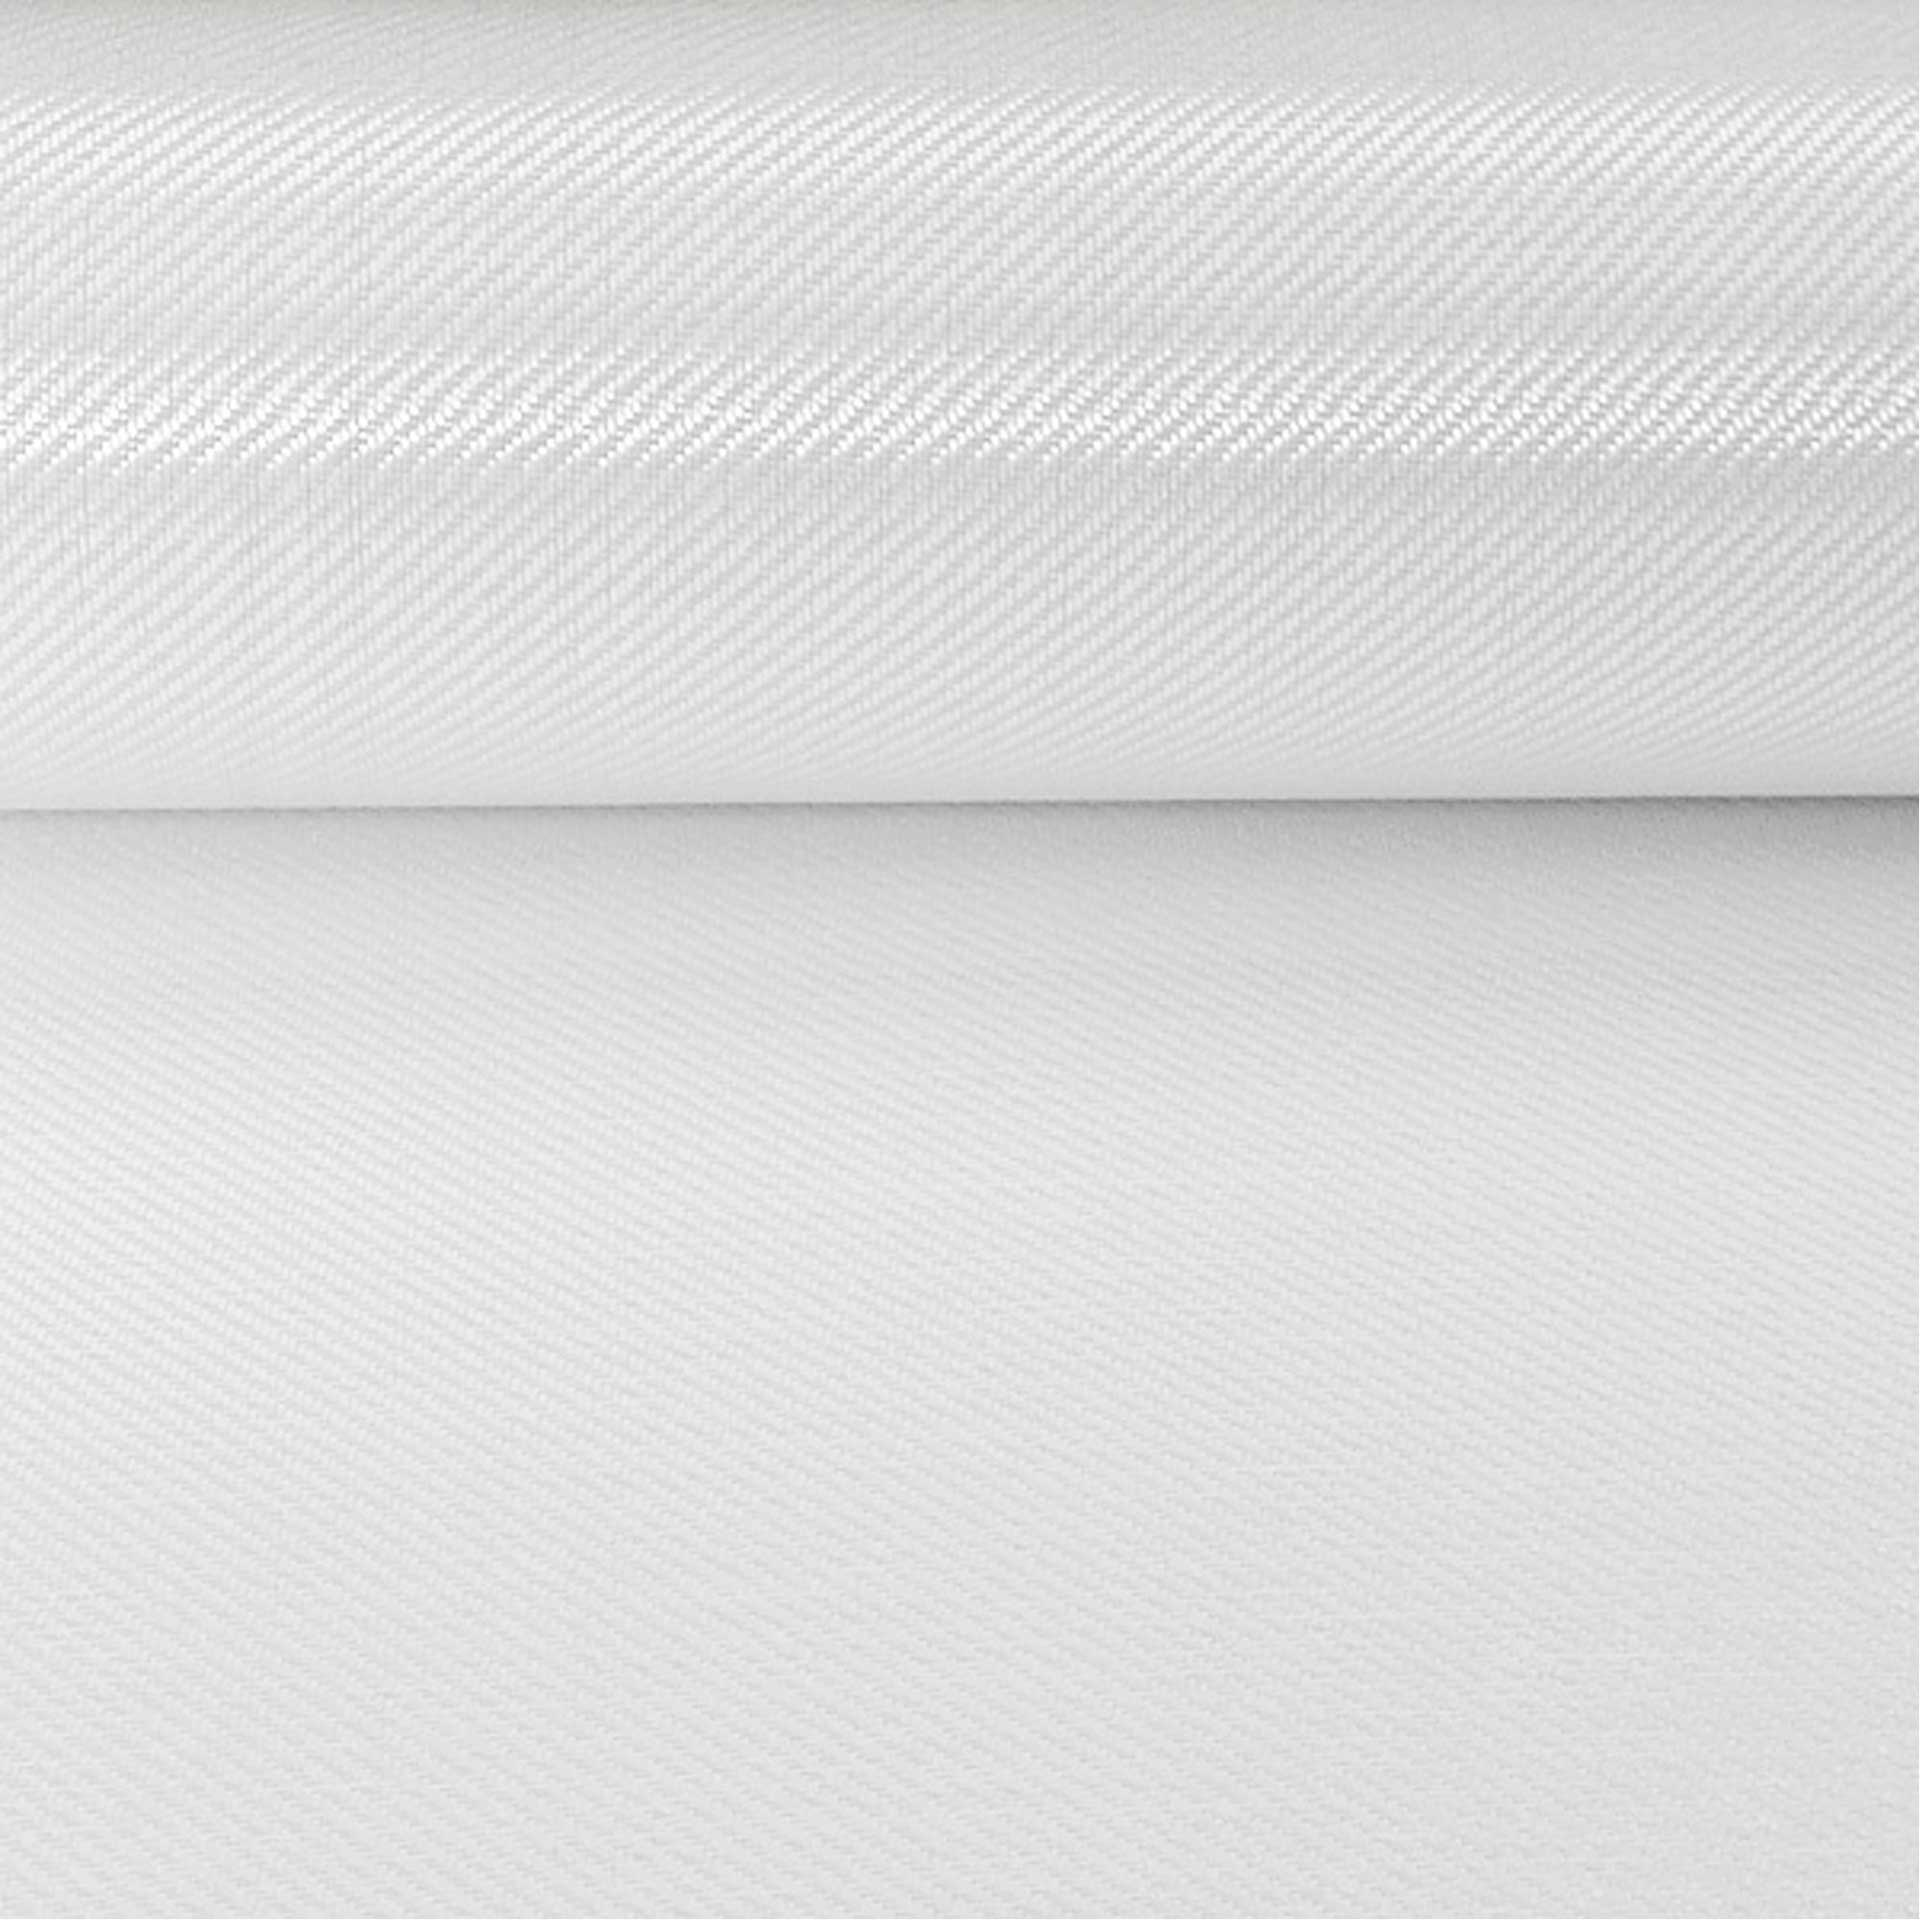 R&G Glasgewebe 80 g/m² (Köper) 100 cm, Rolle/ 50 m